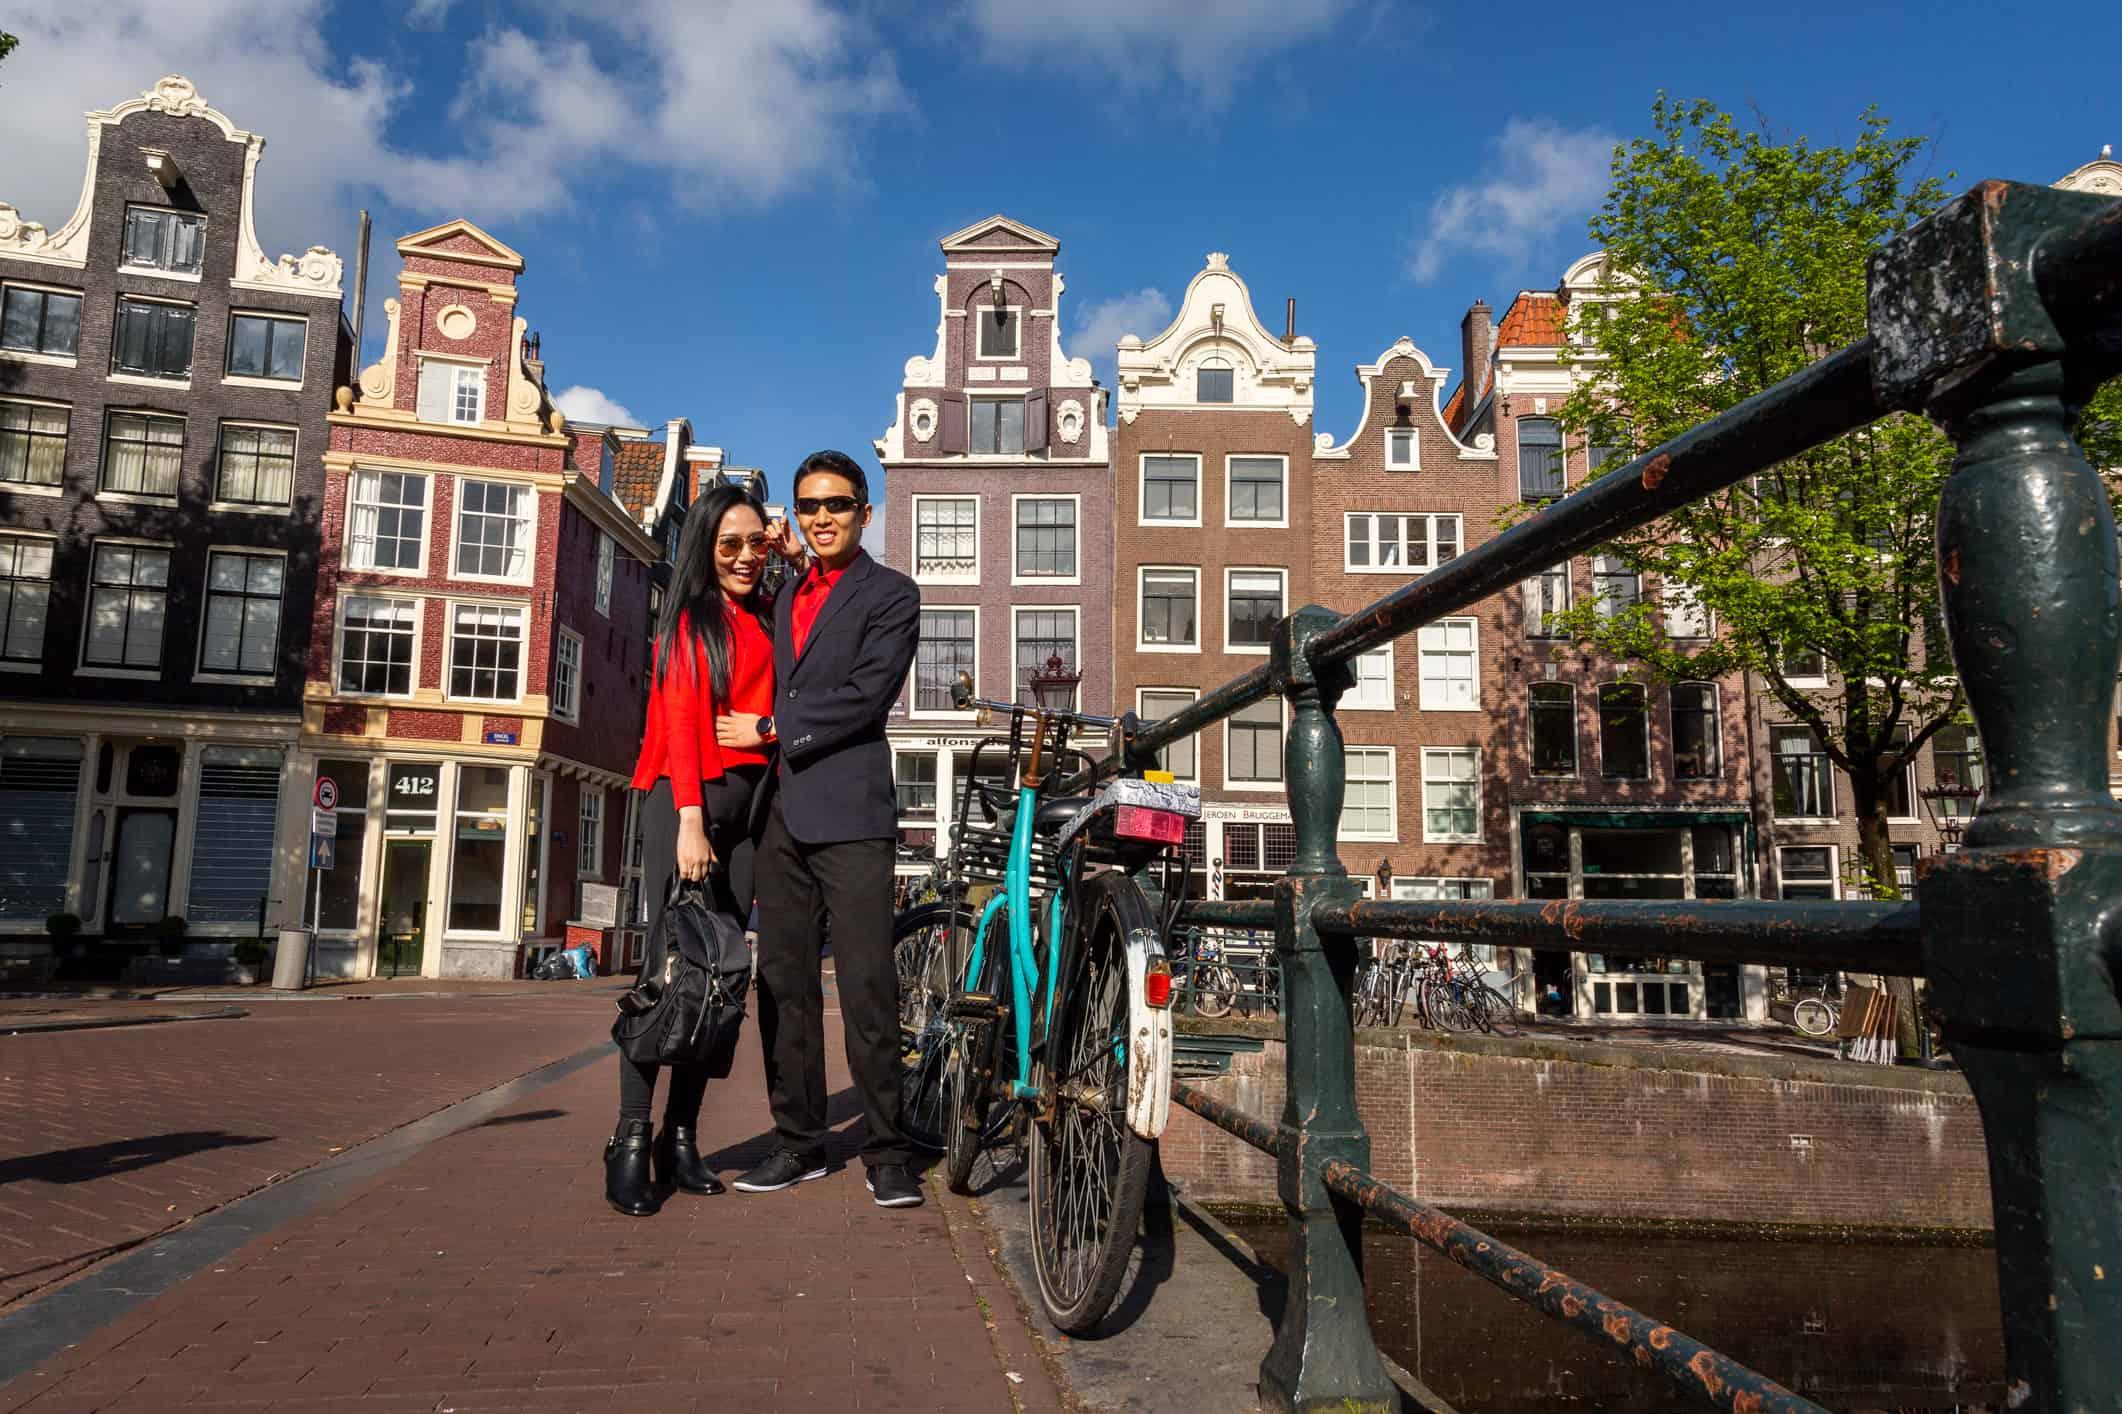 honeymoon proposal photo session Amsterdam